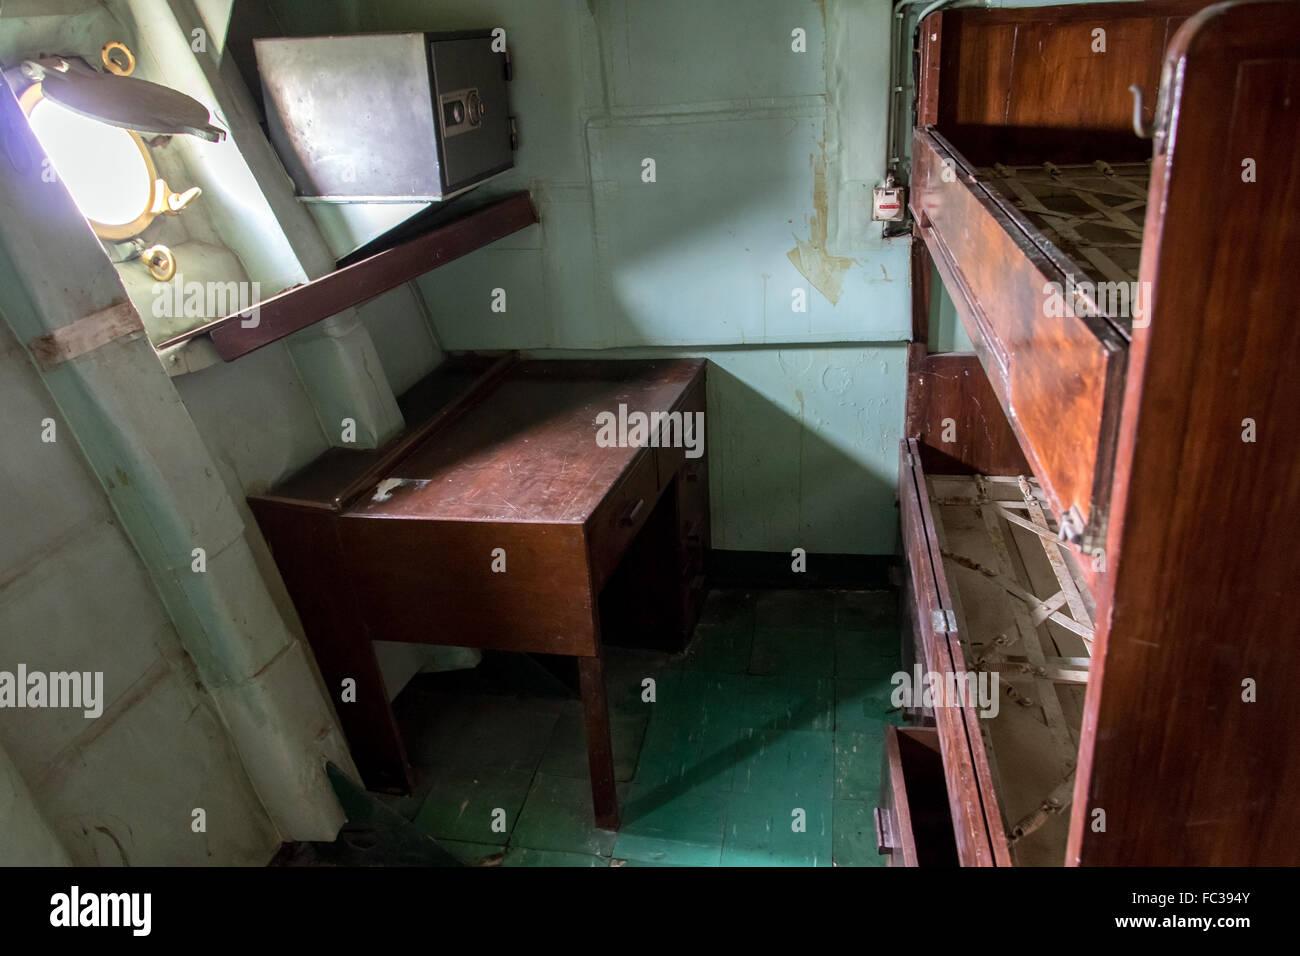 Royal thai navy stock photos royal thai navy stock images alamy bedroom cabin on the old ship stock image buycottarizona